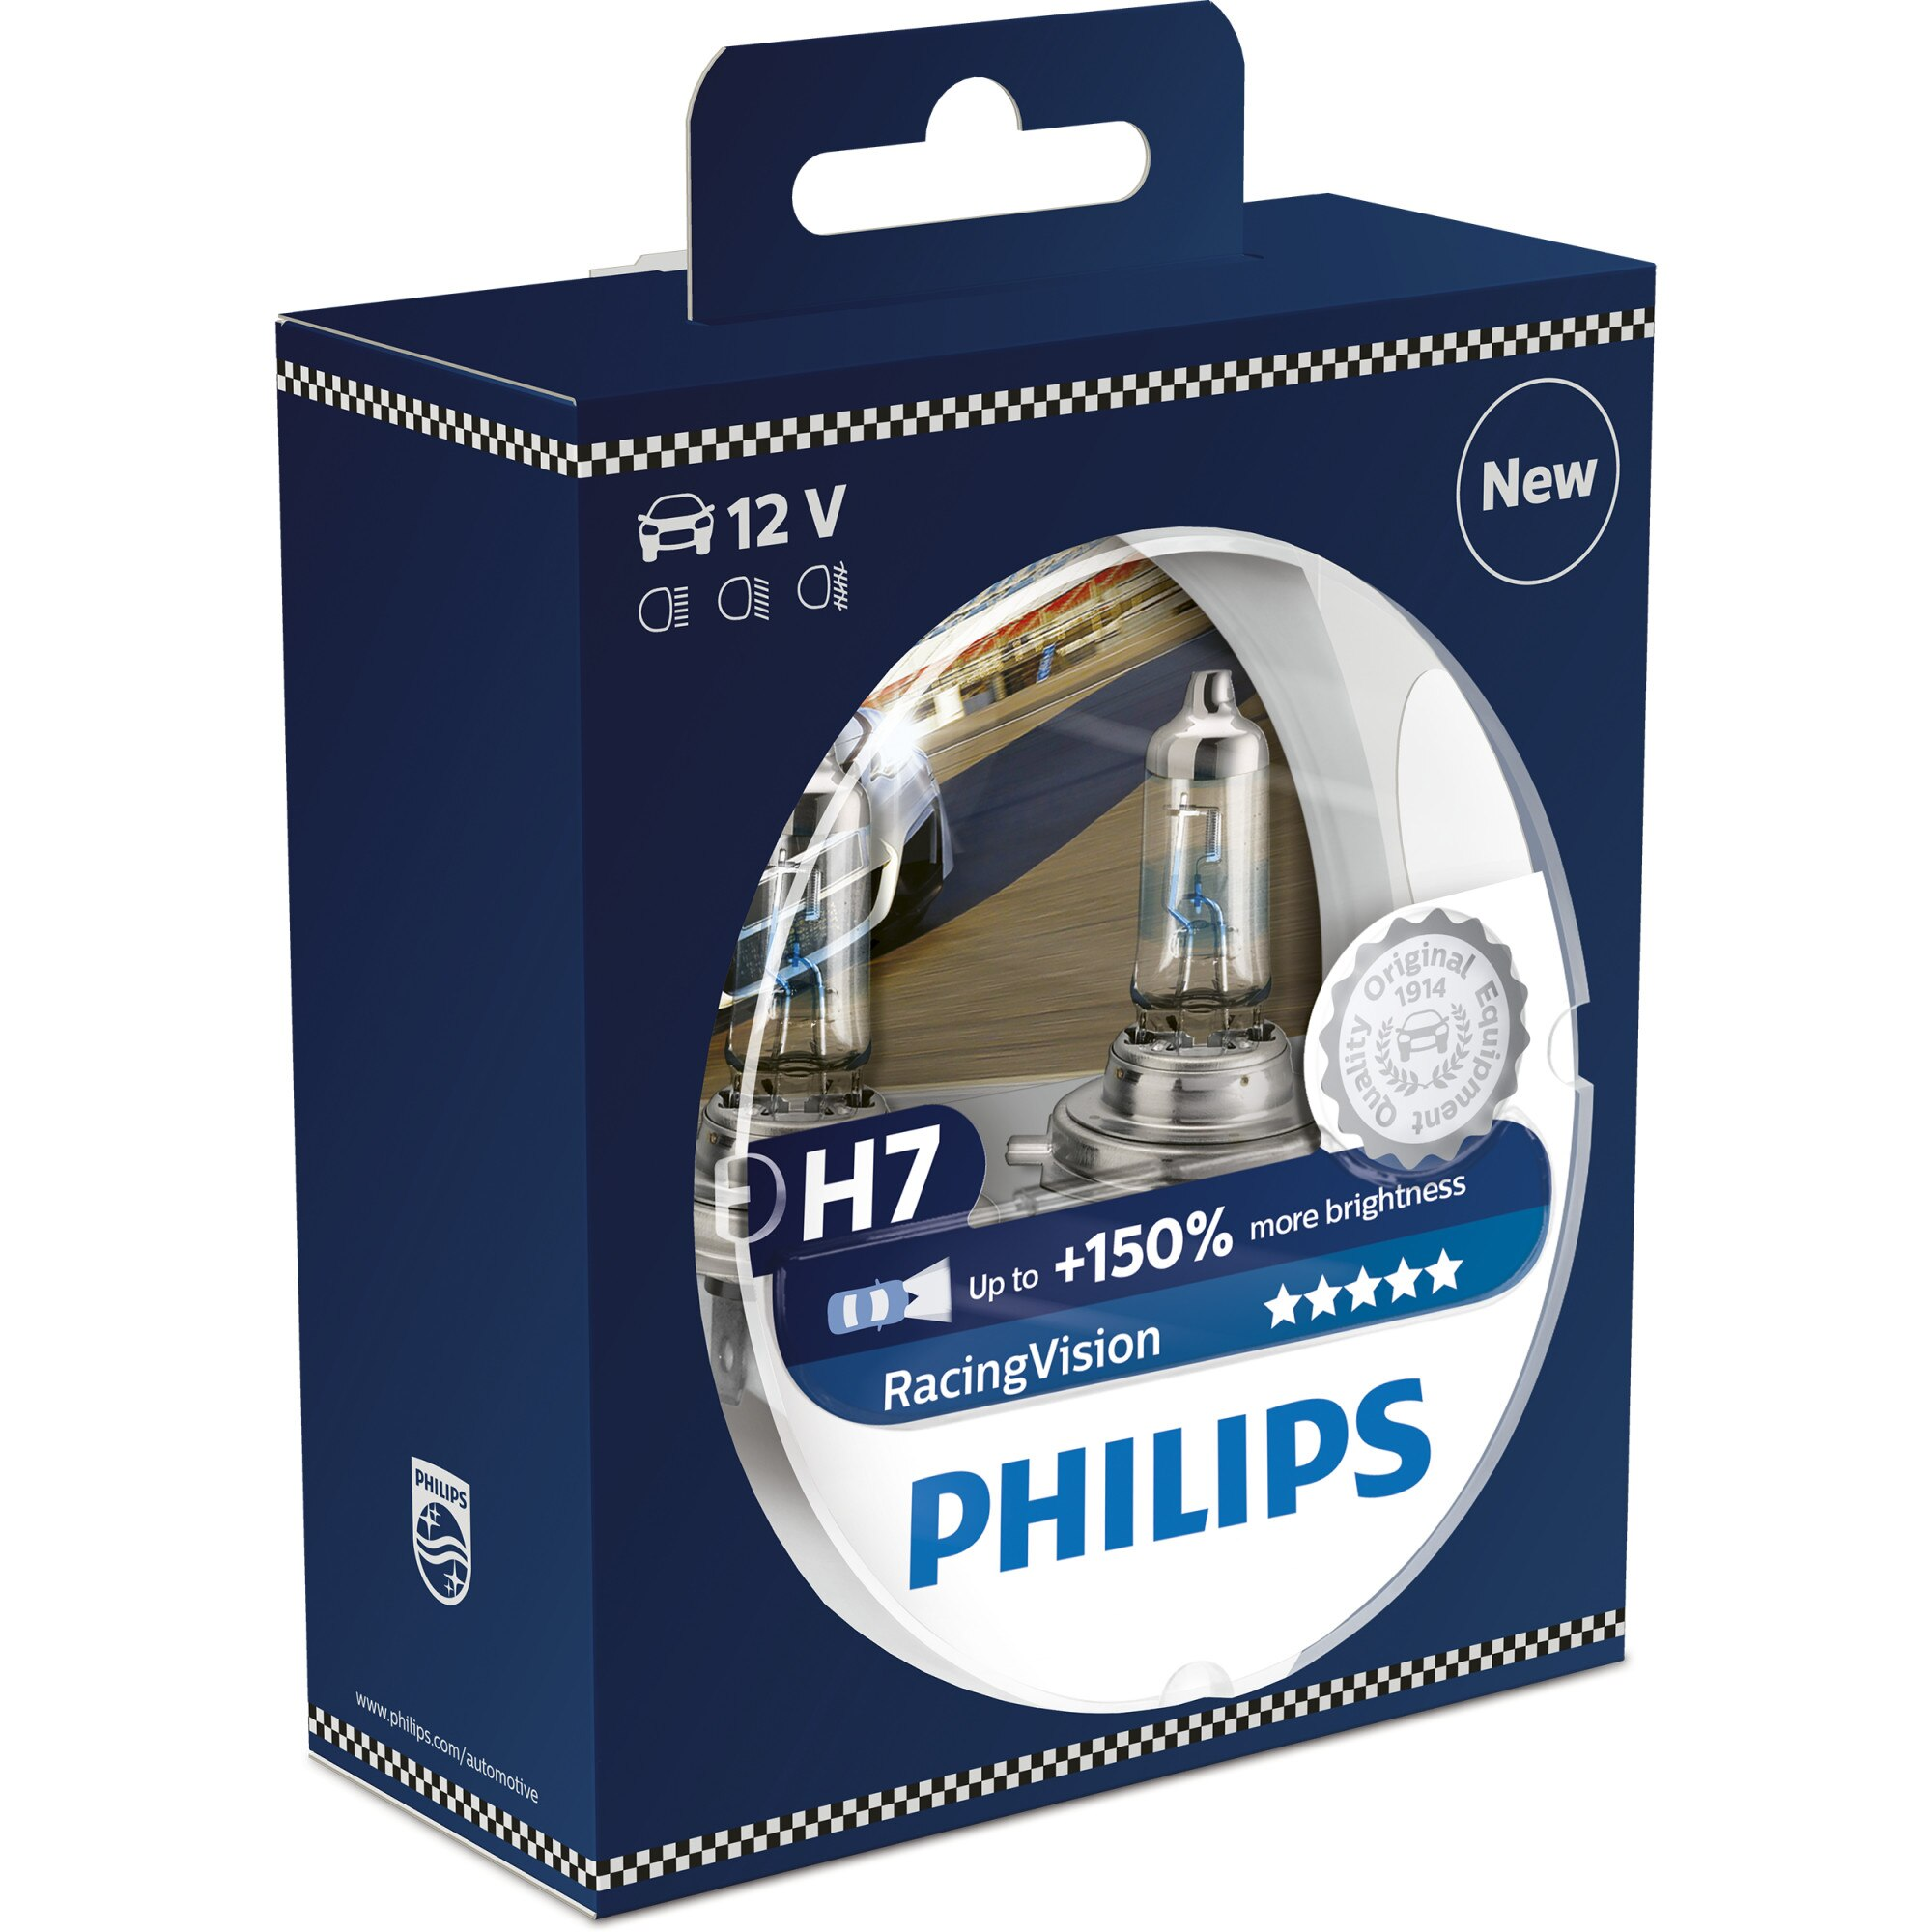 Fotografie Set 2 Becuri auto far cu halogen Philips H7 Racing Vision, 12 V, 55W, 2 buc